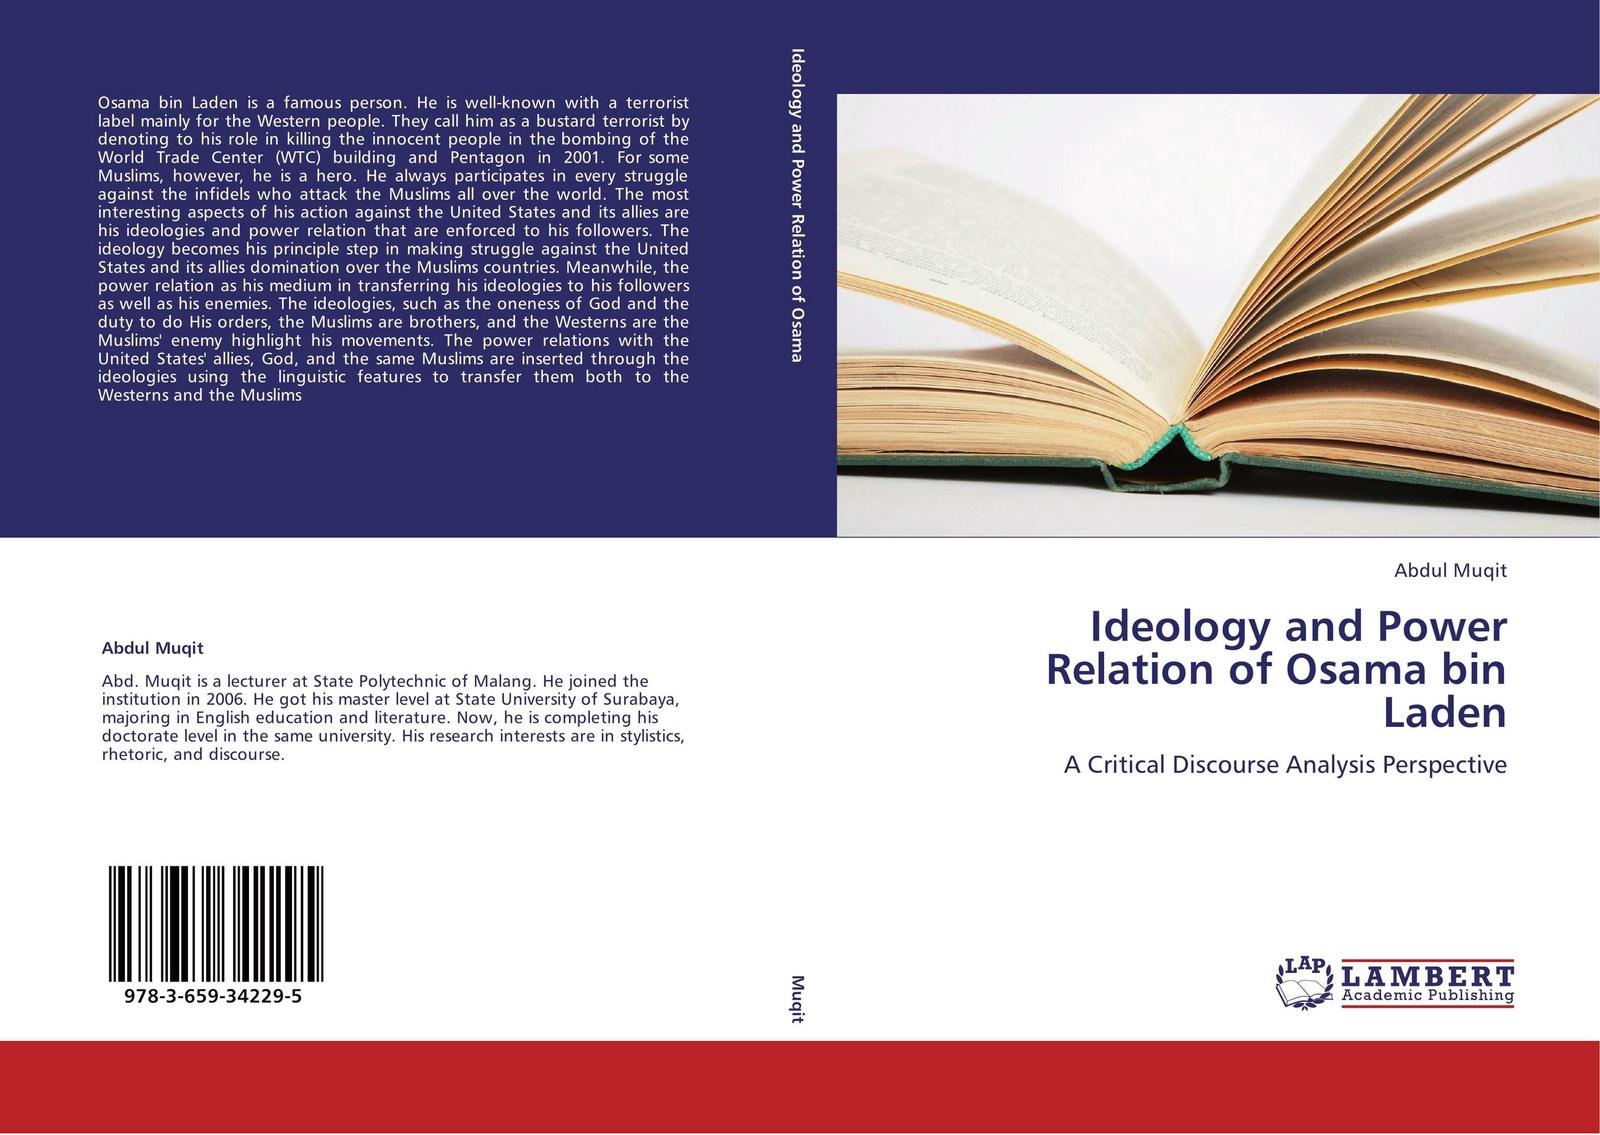 Abdul Muqit Ideology and Power Relation of Osama bin Laden